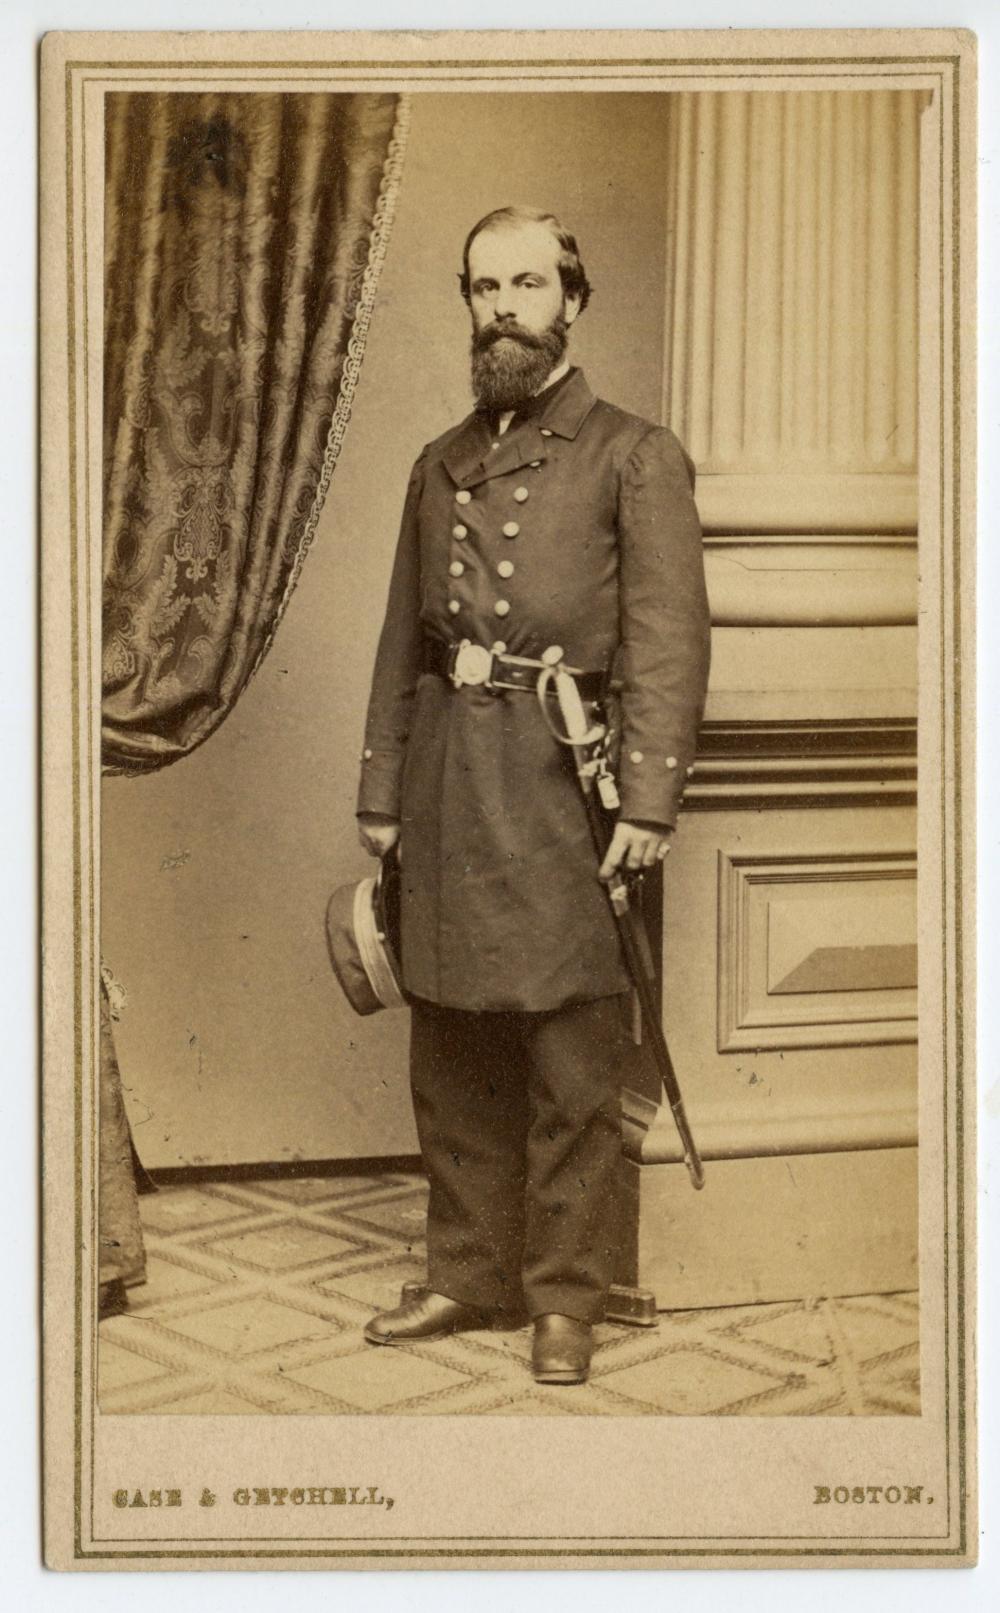 Striking Civil War Naval Officer CDV